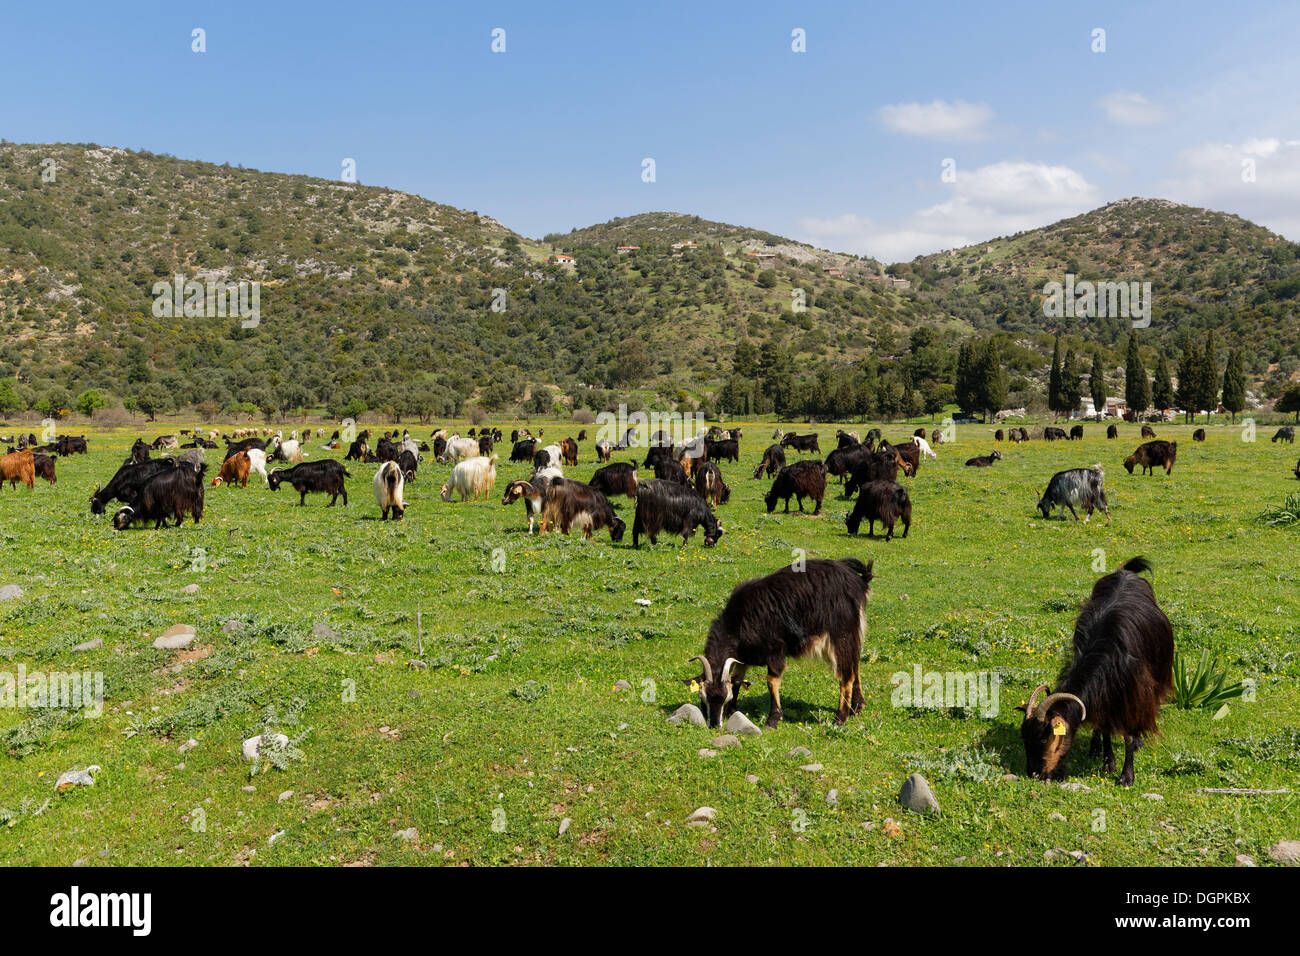 Herd of goats, Karaburun Peninsula, Çeşme Peninsula, İzmir Province, Aegean Region, Turkey - Stock Image